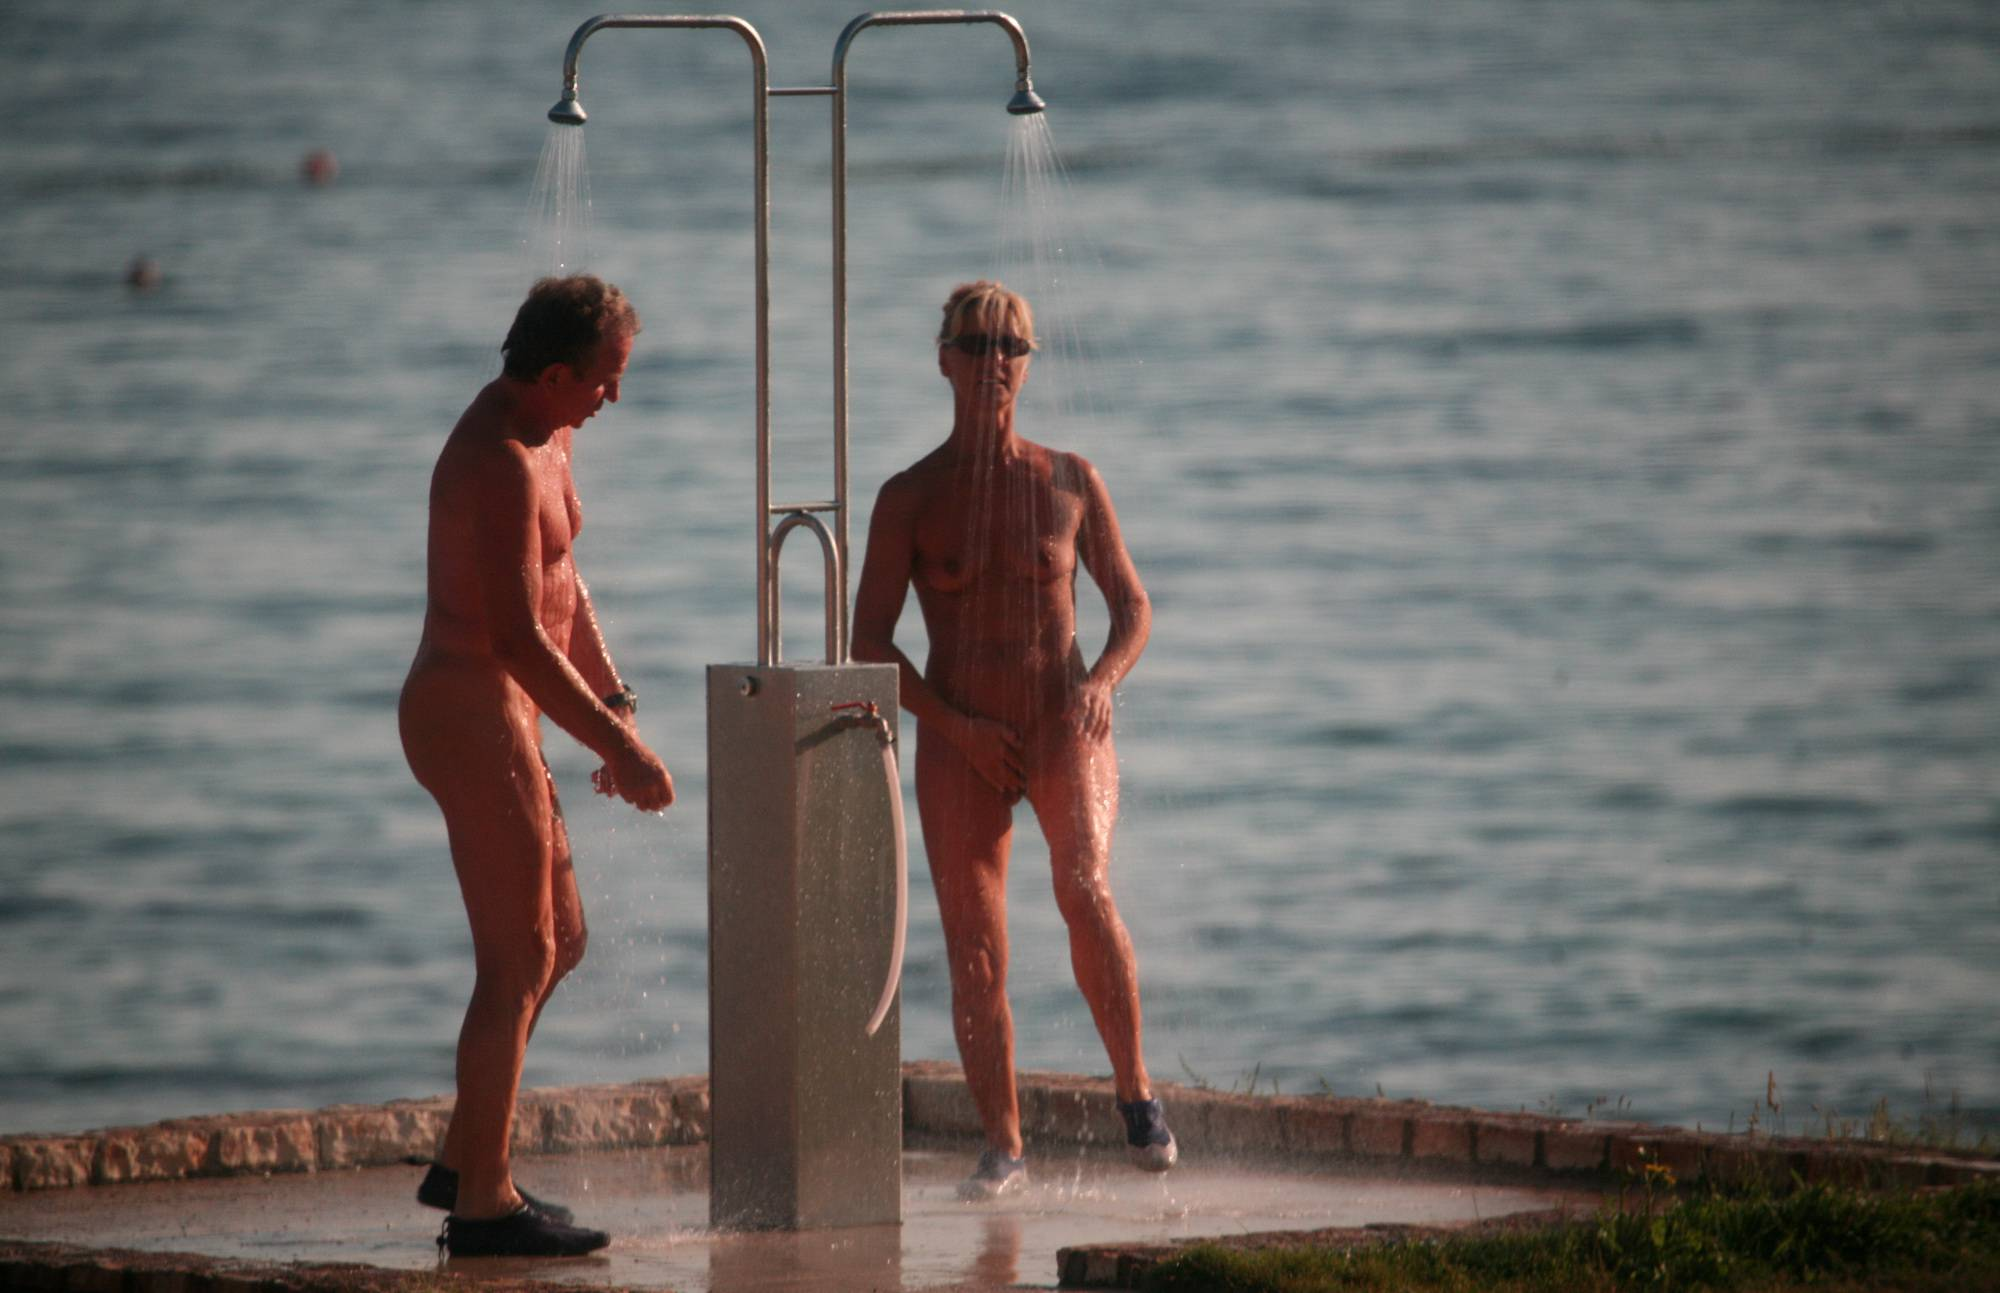 Nudist Pics Dusk Til Dawn Showering - 1